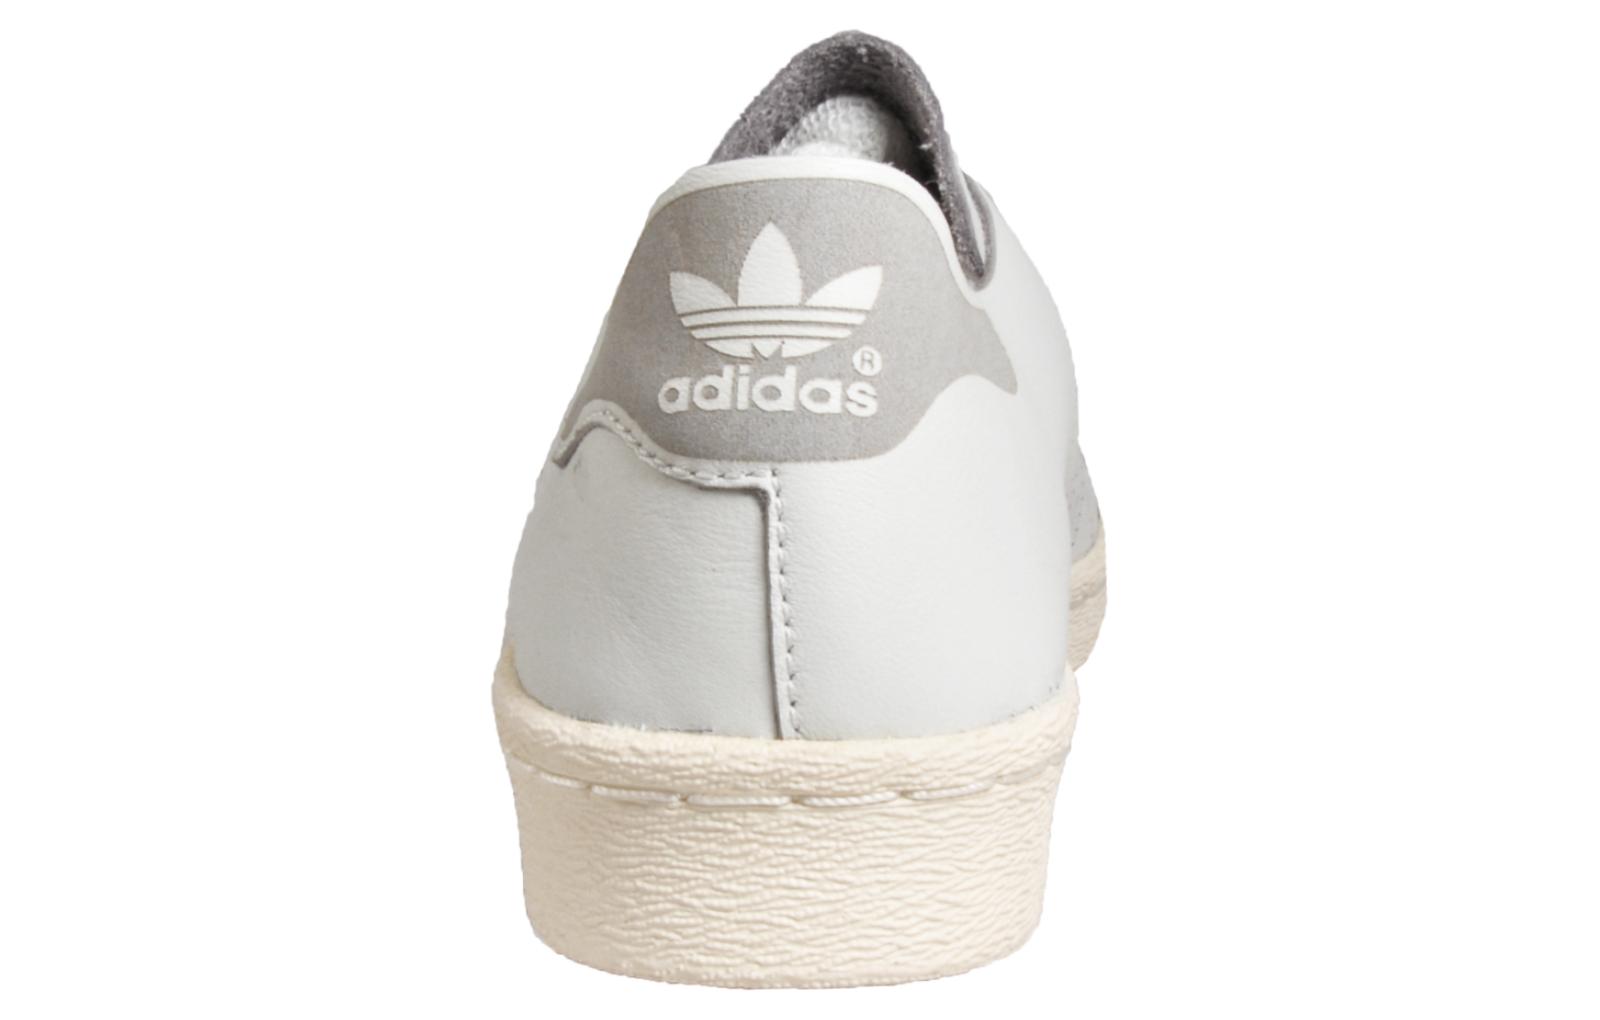 huge selection of ee646 25cc8 Adidas Originals Superstar 80s Decon Women s Casual Vintage Trainers B Grade